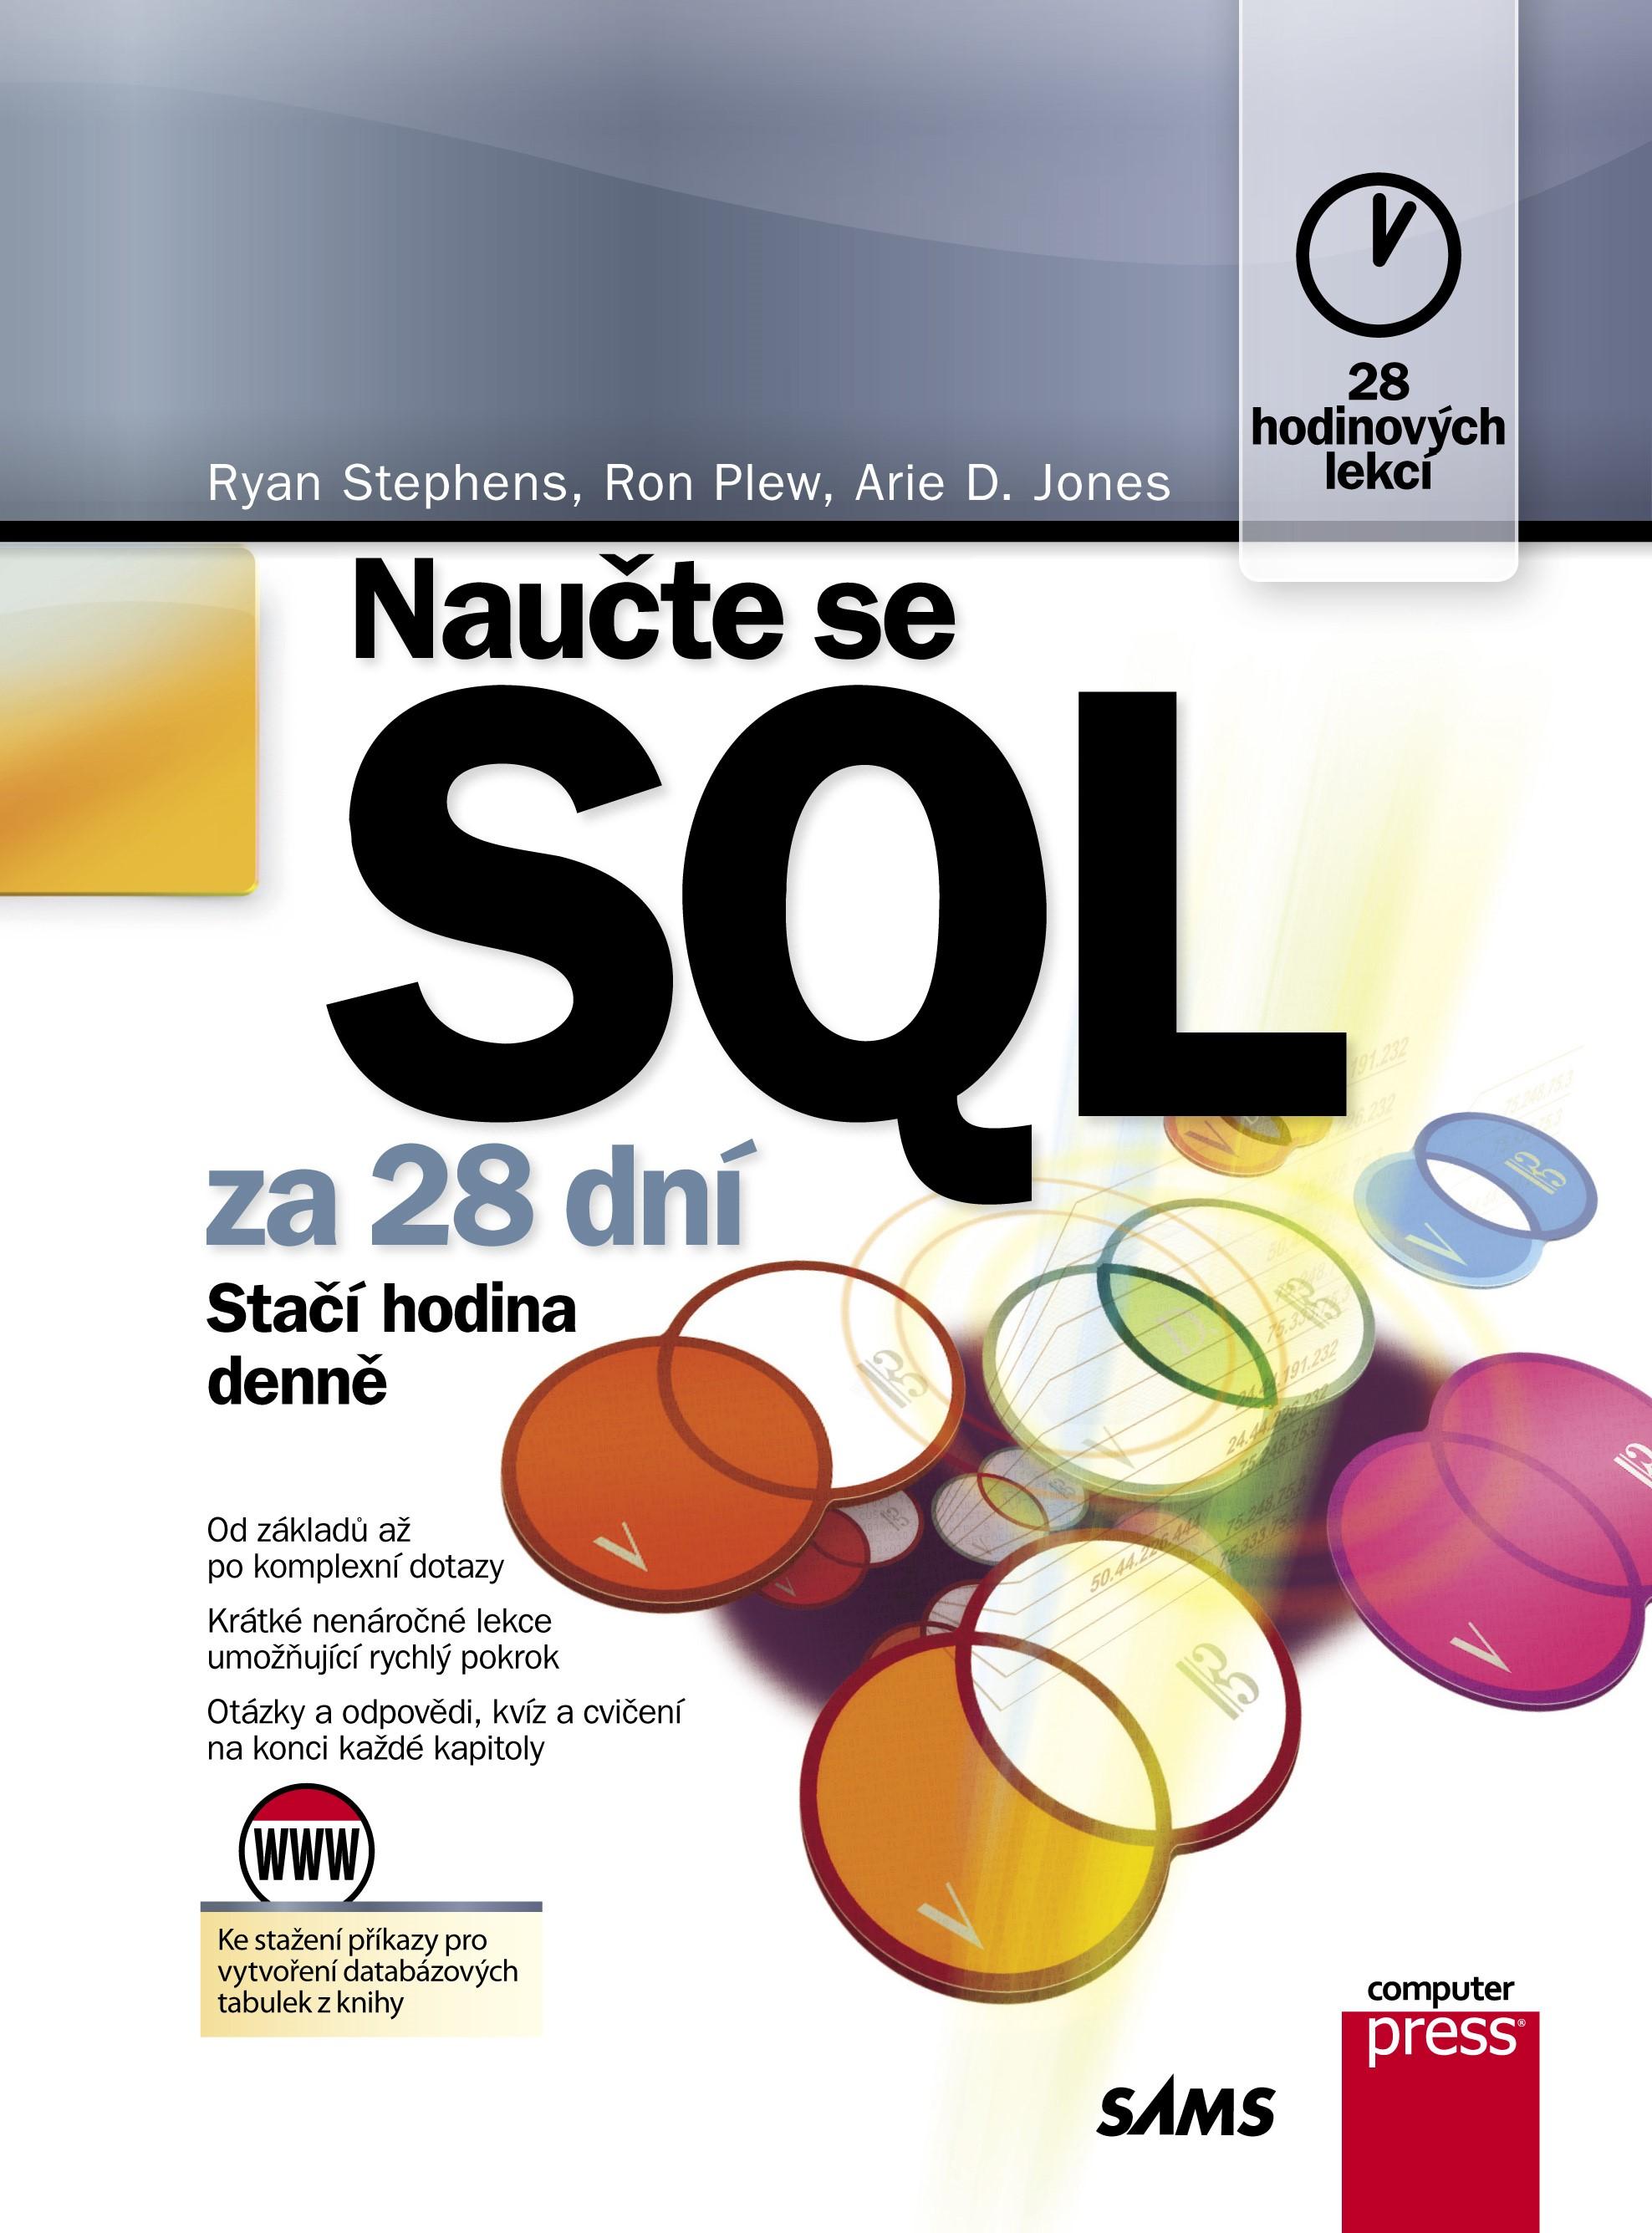 Naučte se SQL za 28 dní | Arie D. Jones, Ron Plew, Ryan K. Stephens